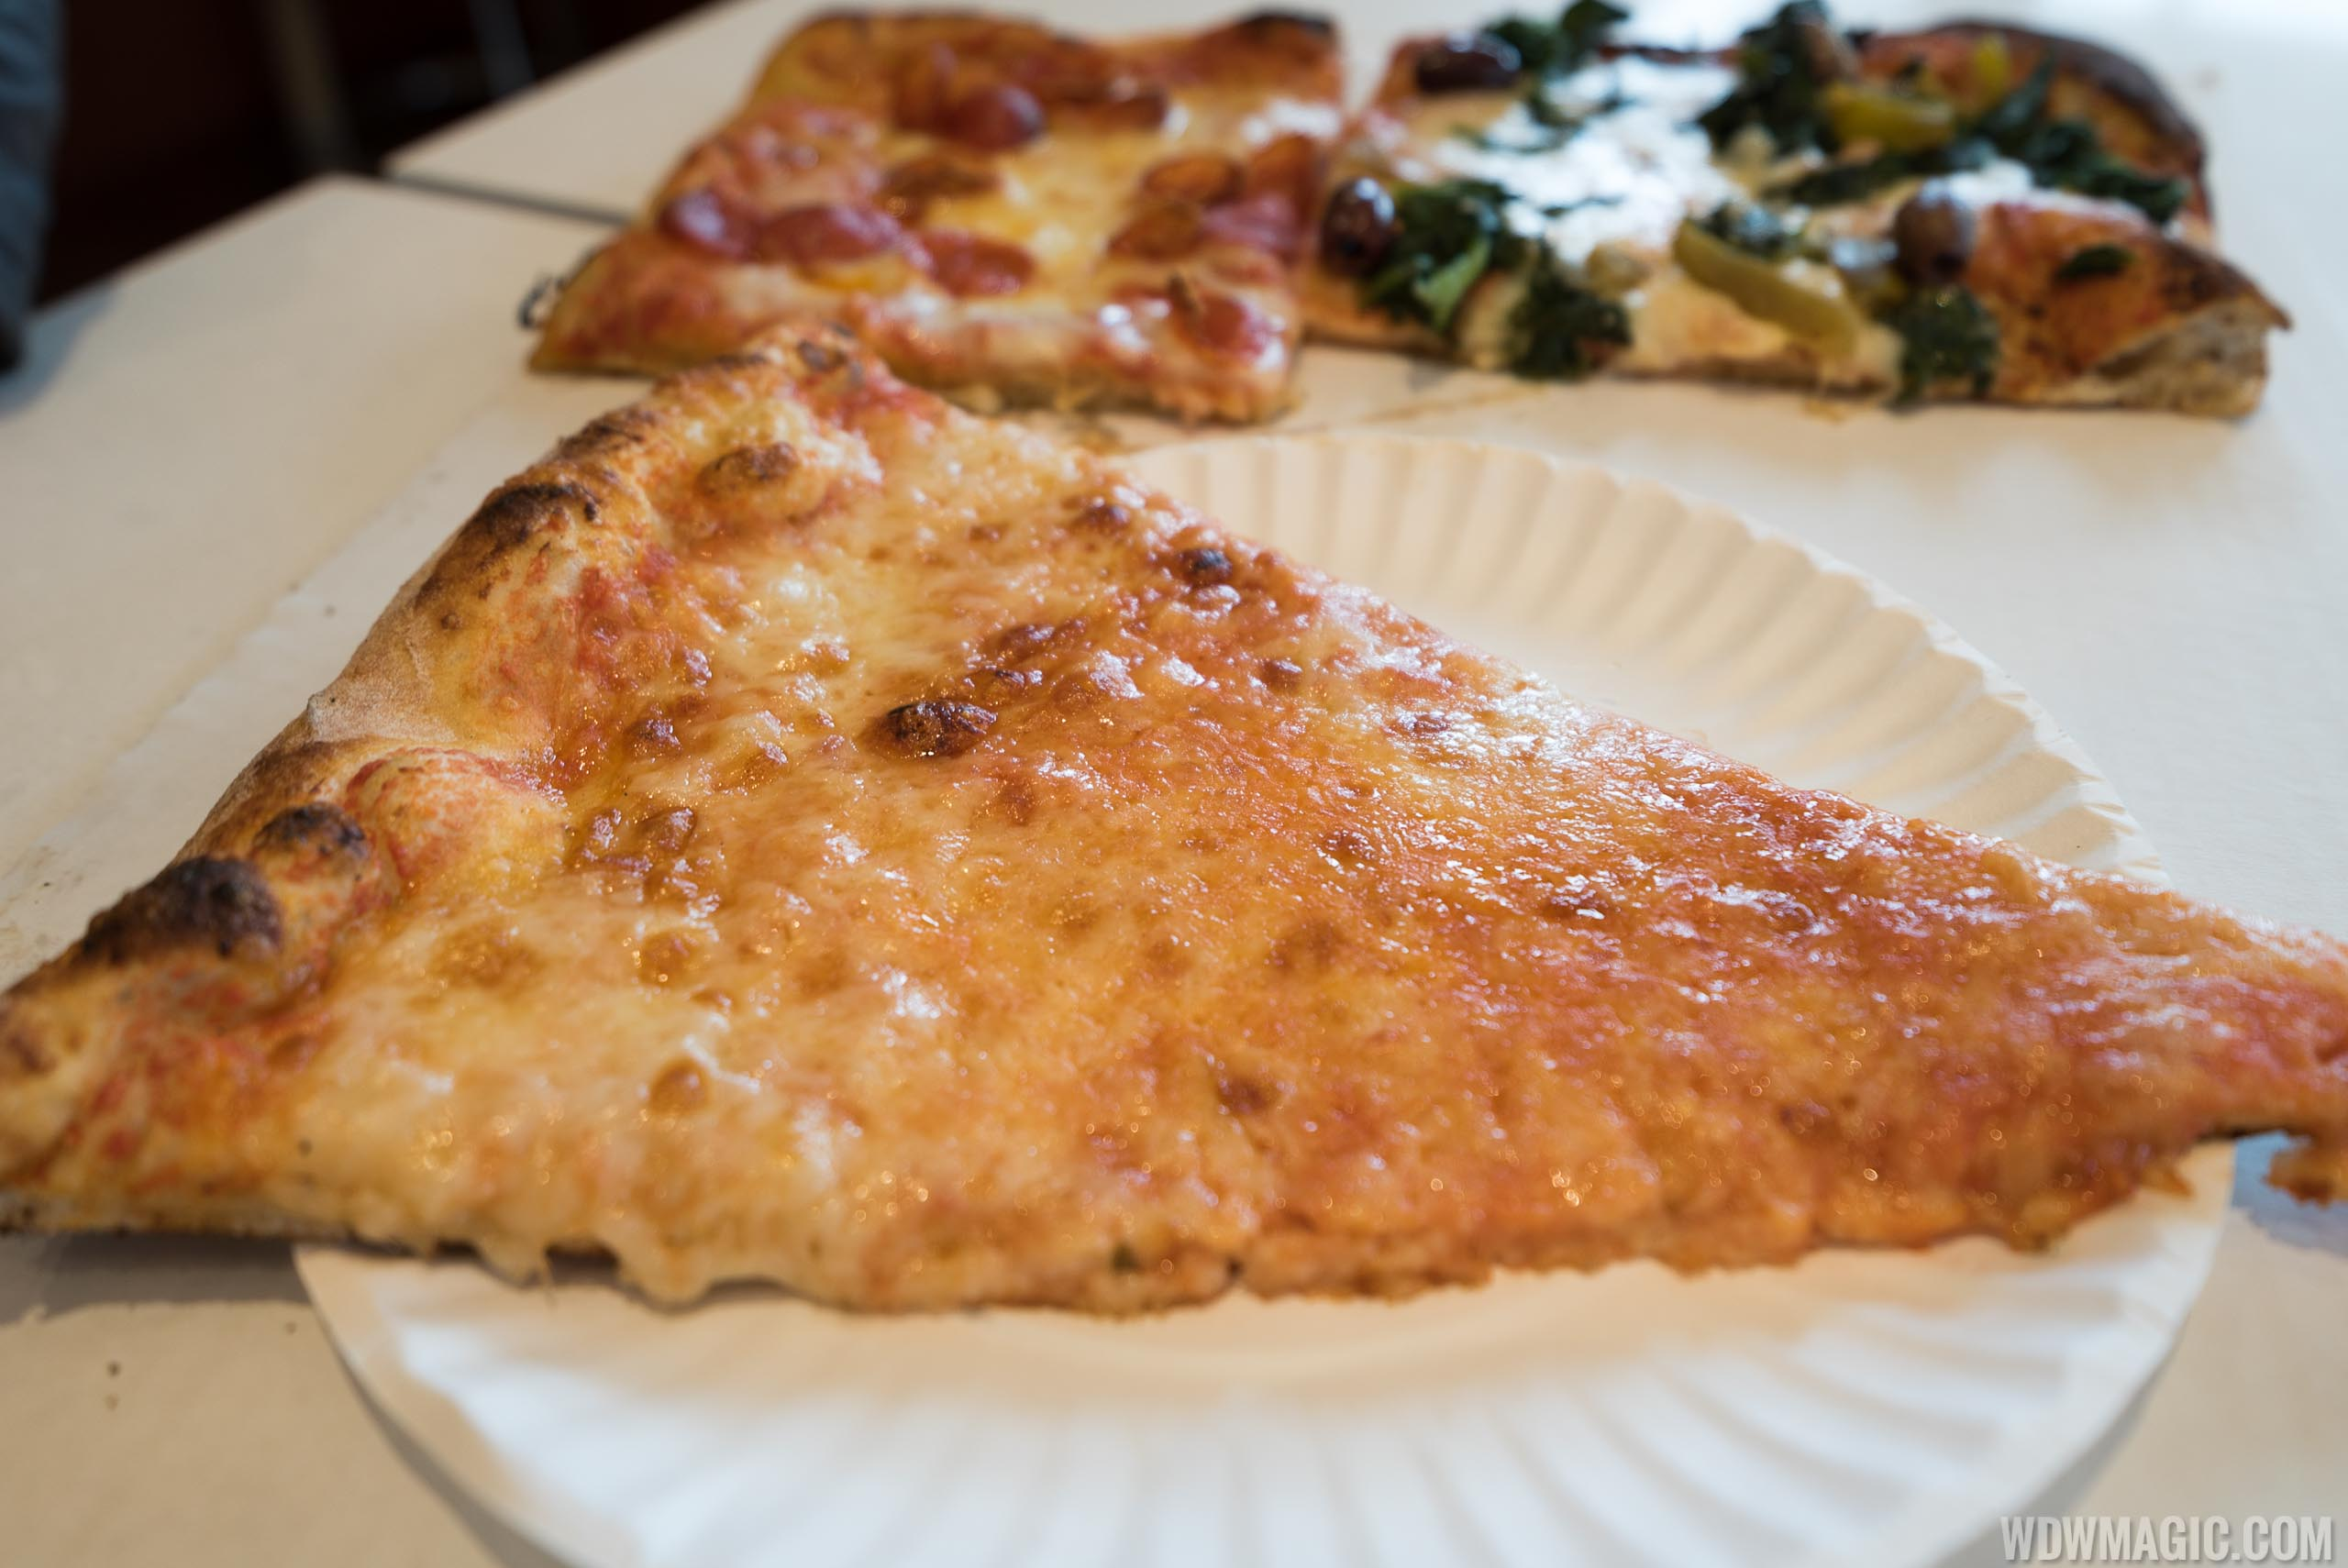 Pizza Ponte - Slice of The Big Roman